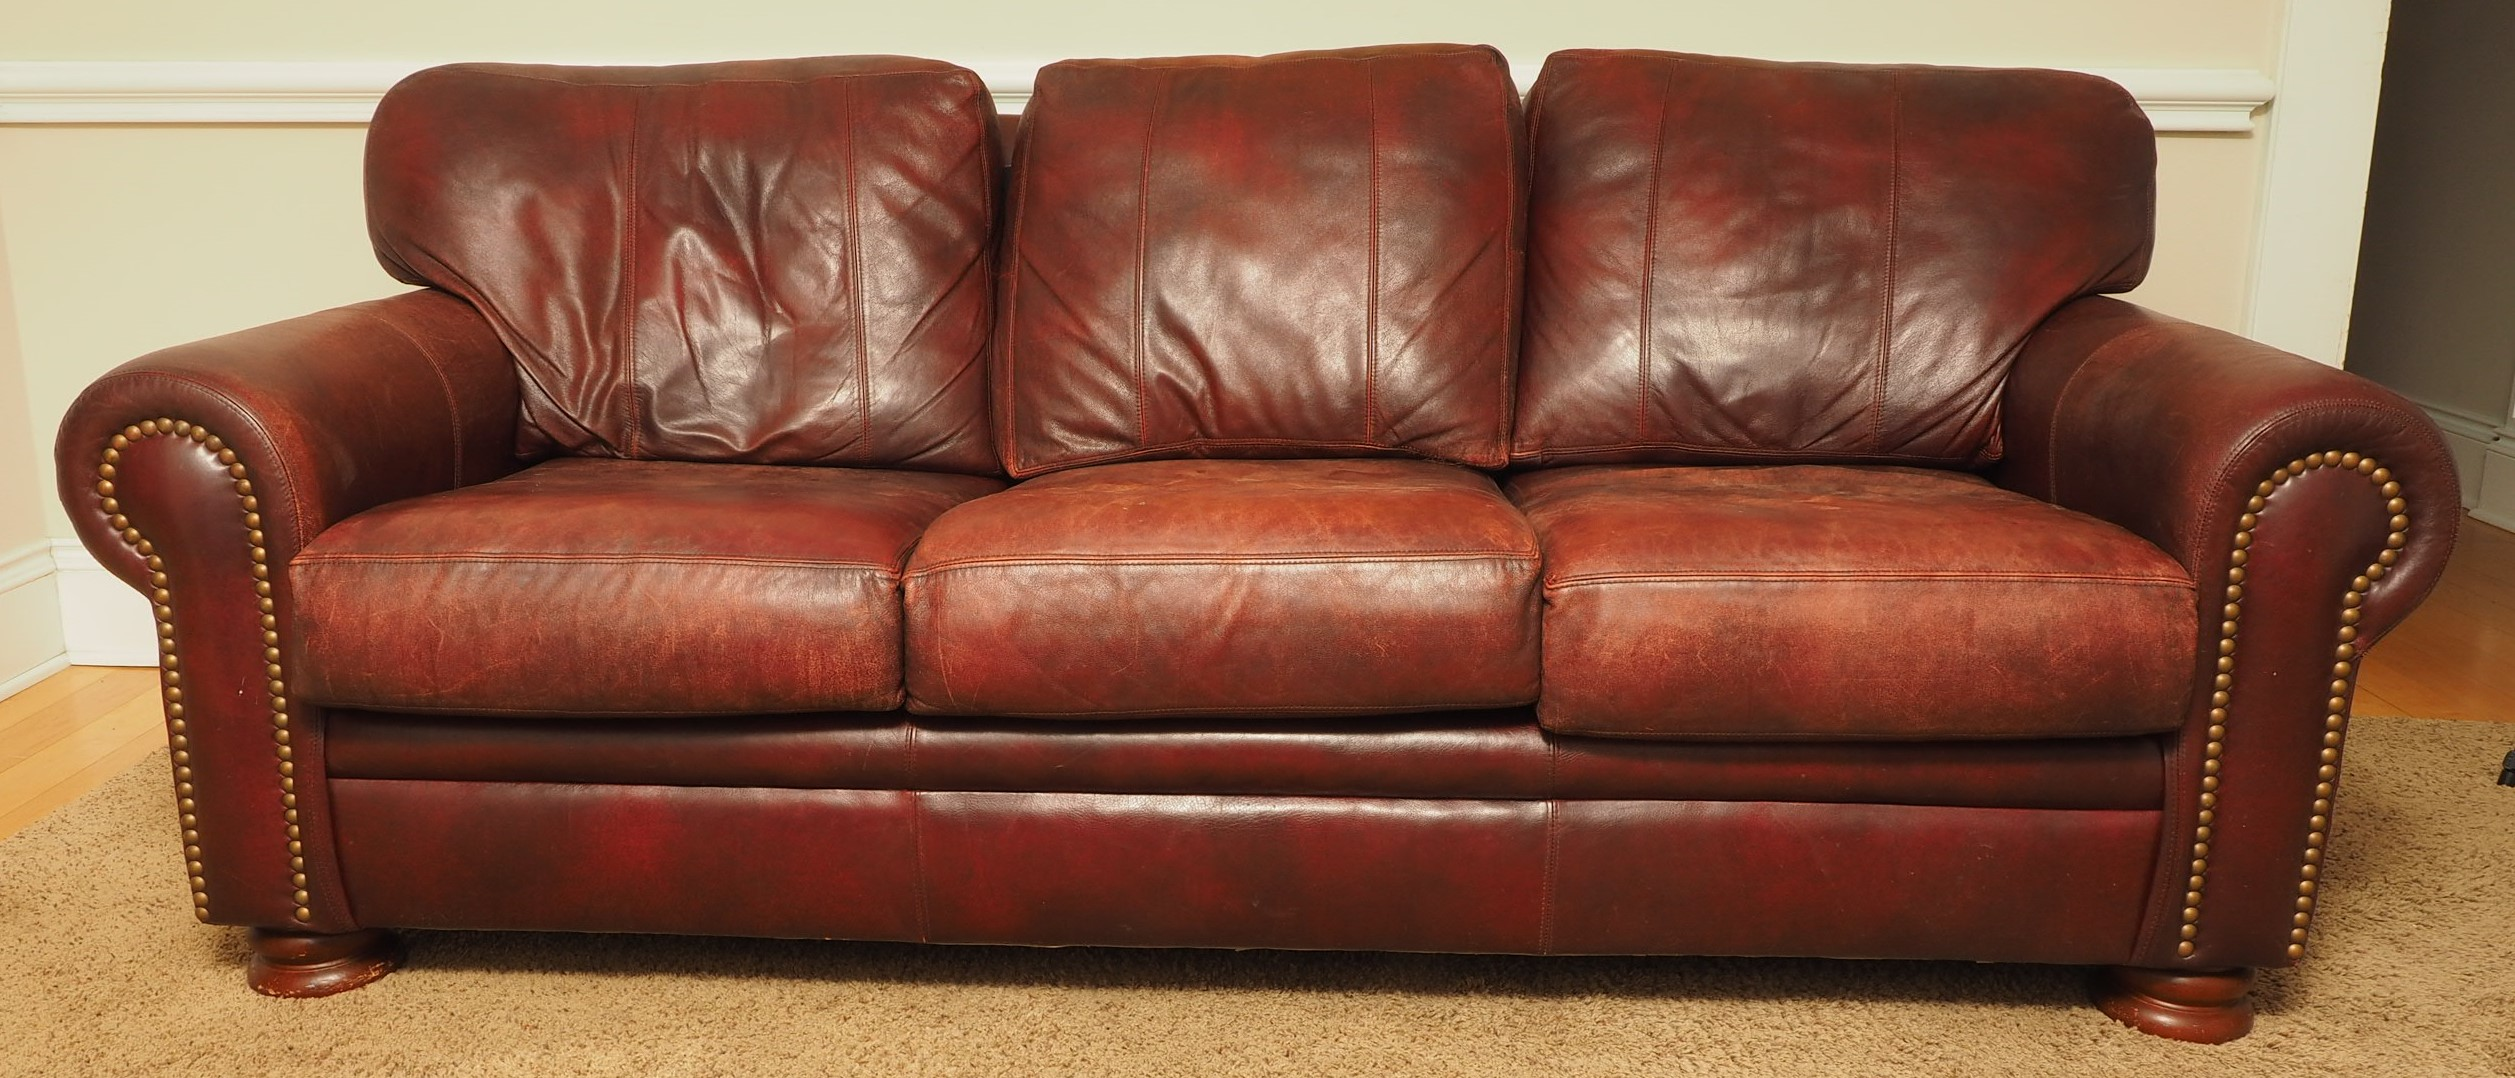 clean a leather sofa sleeper mattresses bradington young | black rock galleries